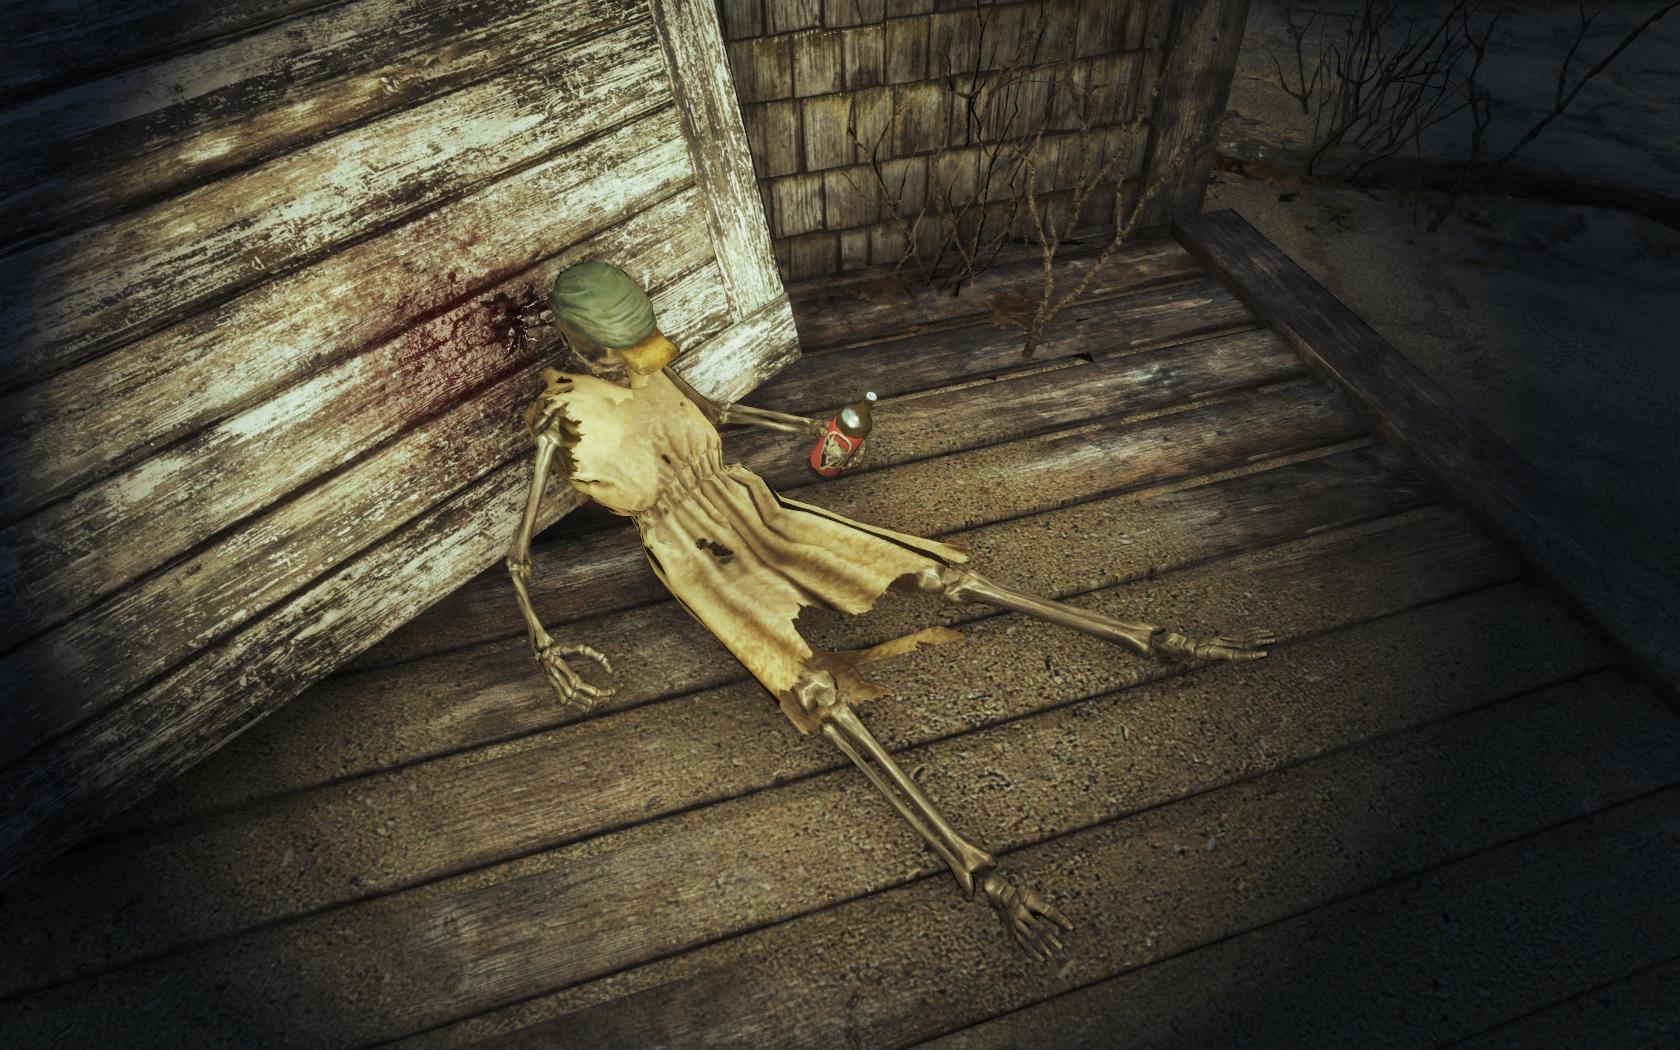 Кайфуем! (Фар-Харбор, севернее Туристического центра национального парка) - Fallout 4 скелет, Туристический центр национального парка